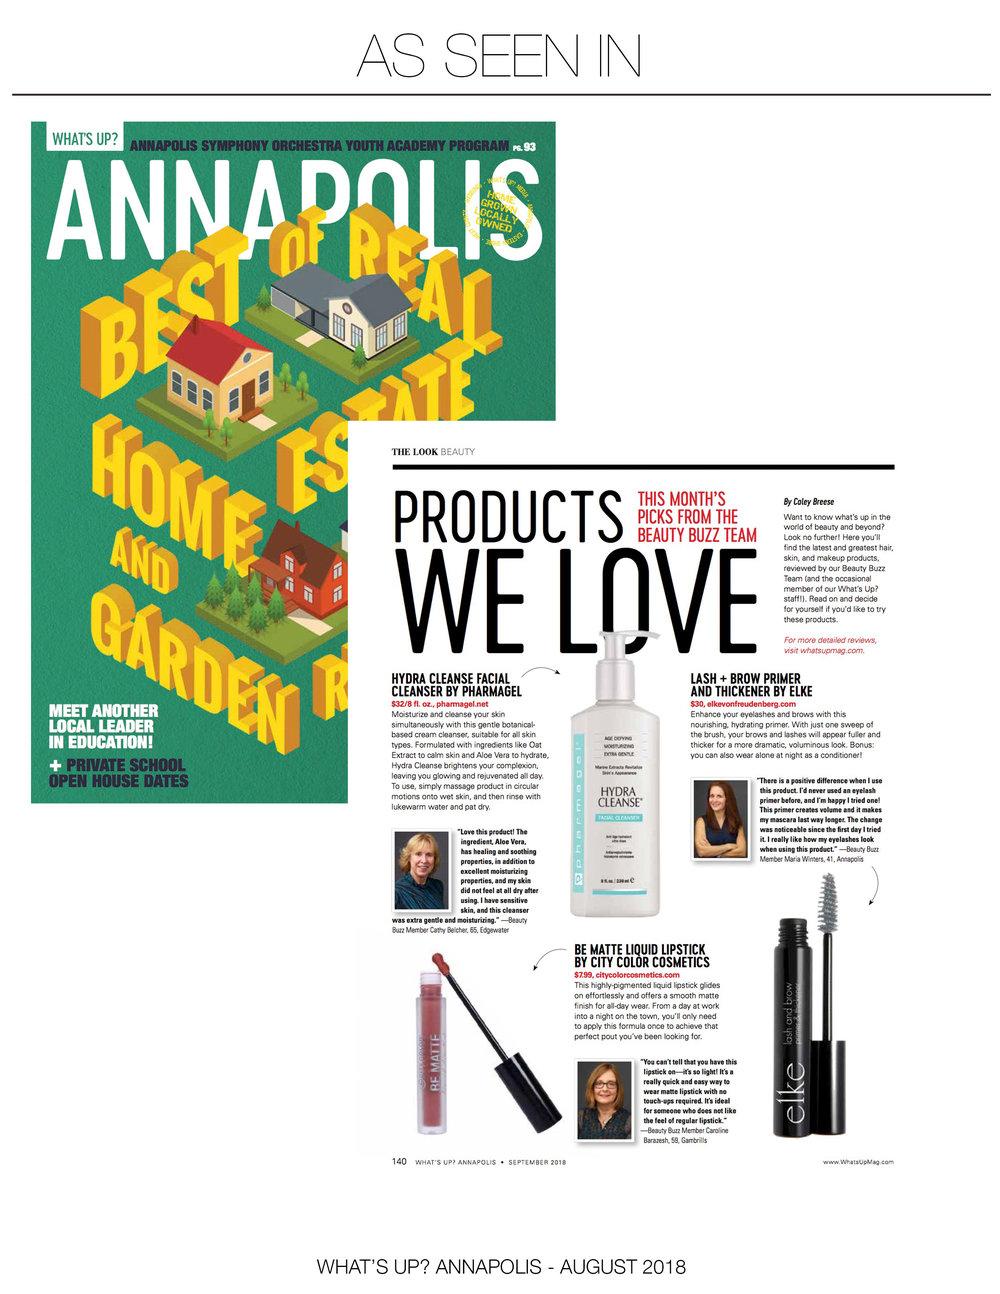 Pharmagel_WHAT'S UP_ ANNAPOLIS_August2018.jpg